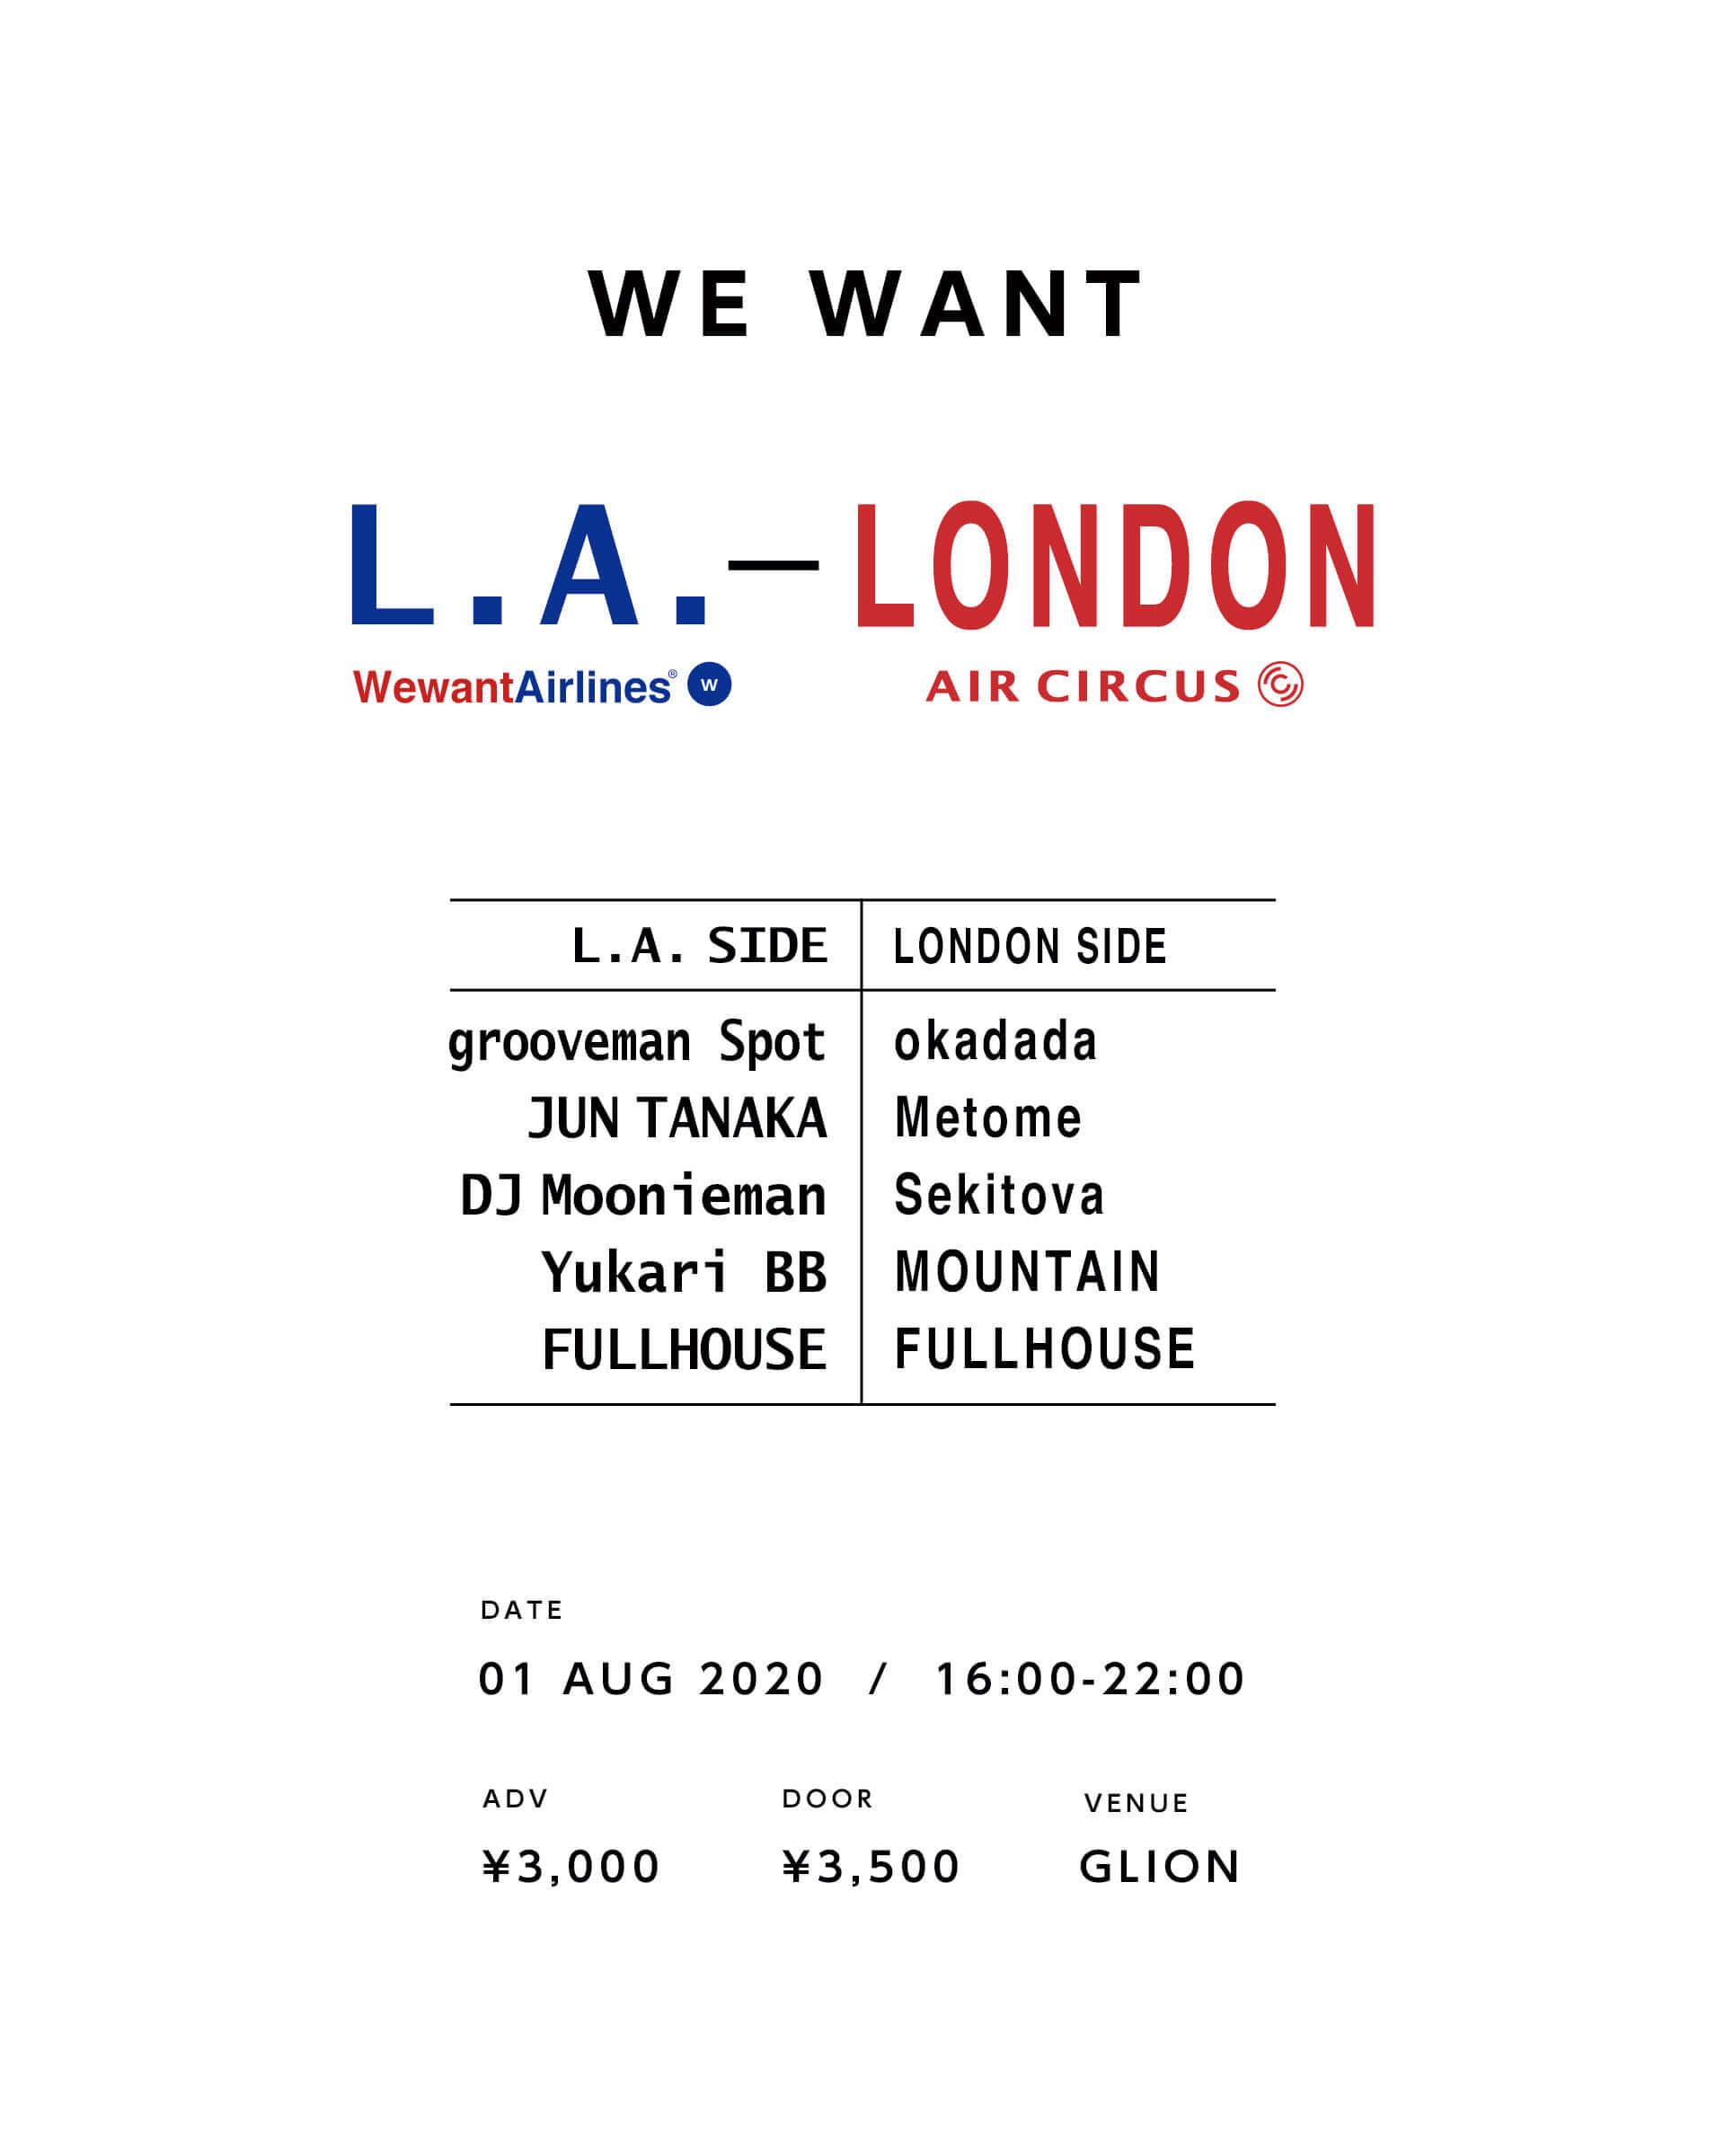 CIRCUSとWE WANTが屋外パーティー<WE WANT L.A - LONDON>を開催決定!okadada、Sekitova、Metomeら出演 music200708_wewant_-1920x2400